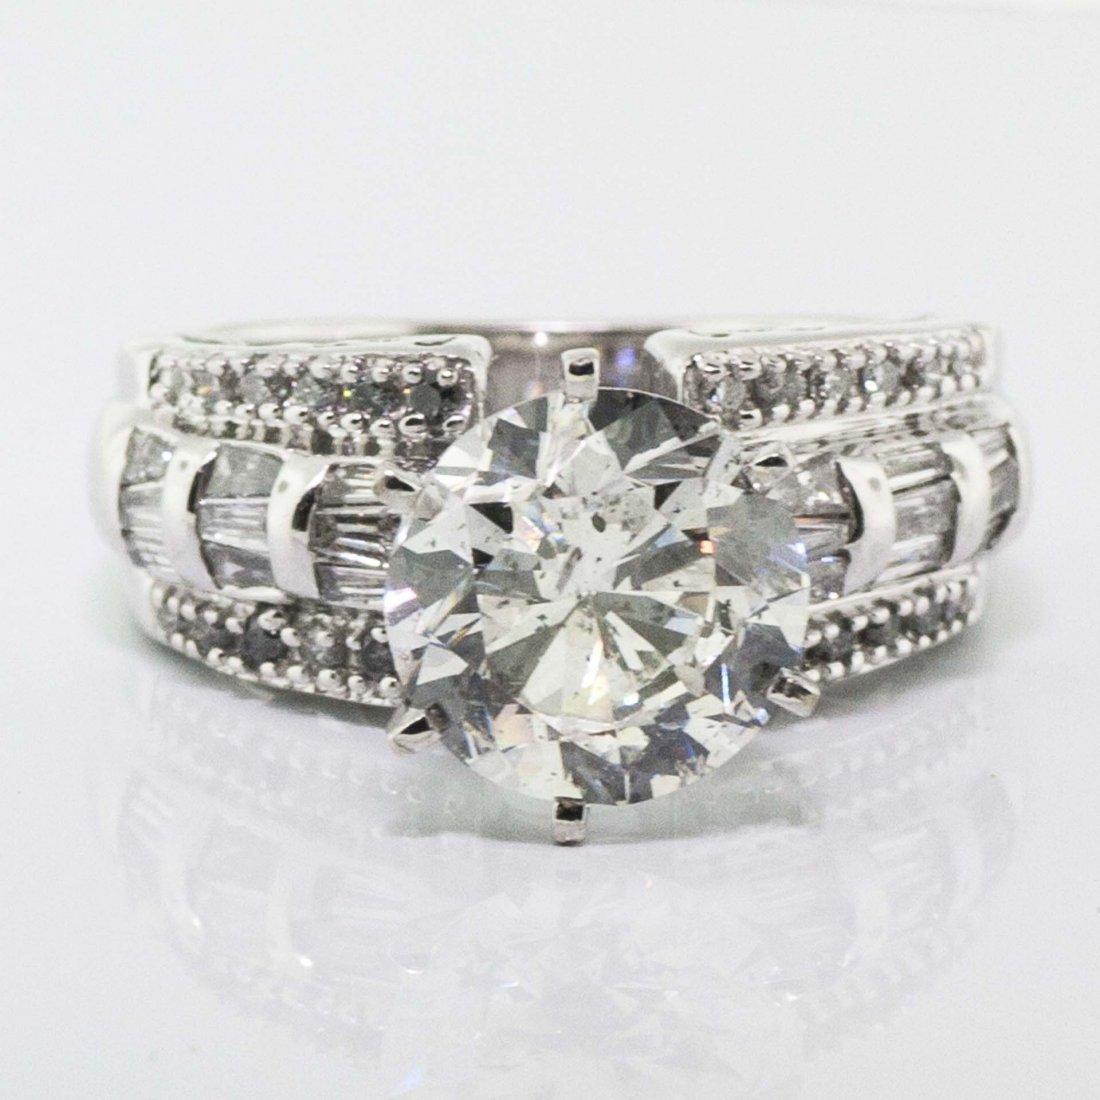 IGI CERTIFIED 4.62CT E SI2 CENTER DIAMOND 5.62 TW  RING